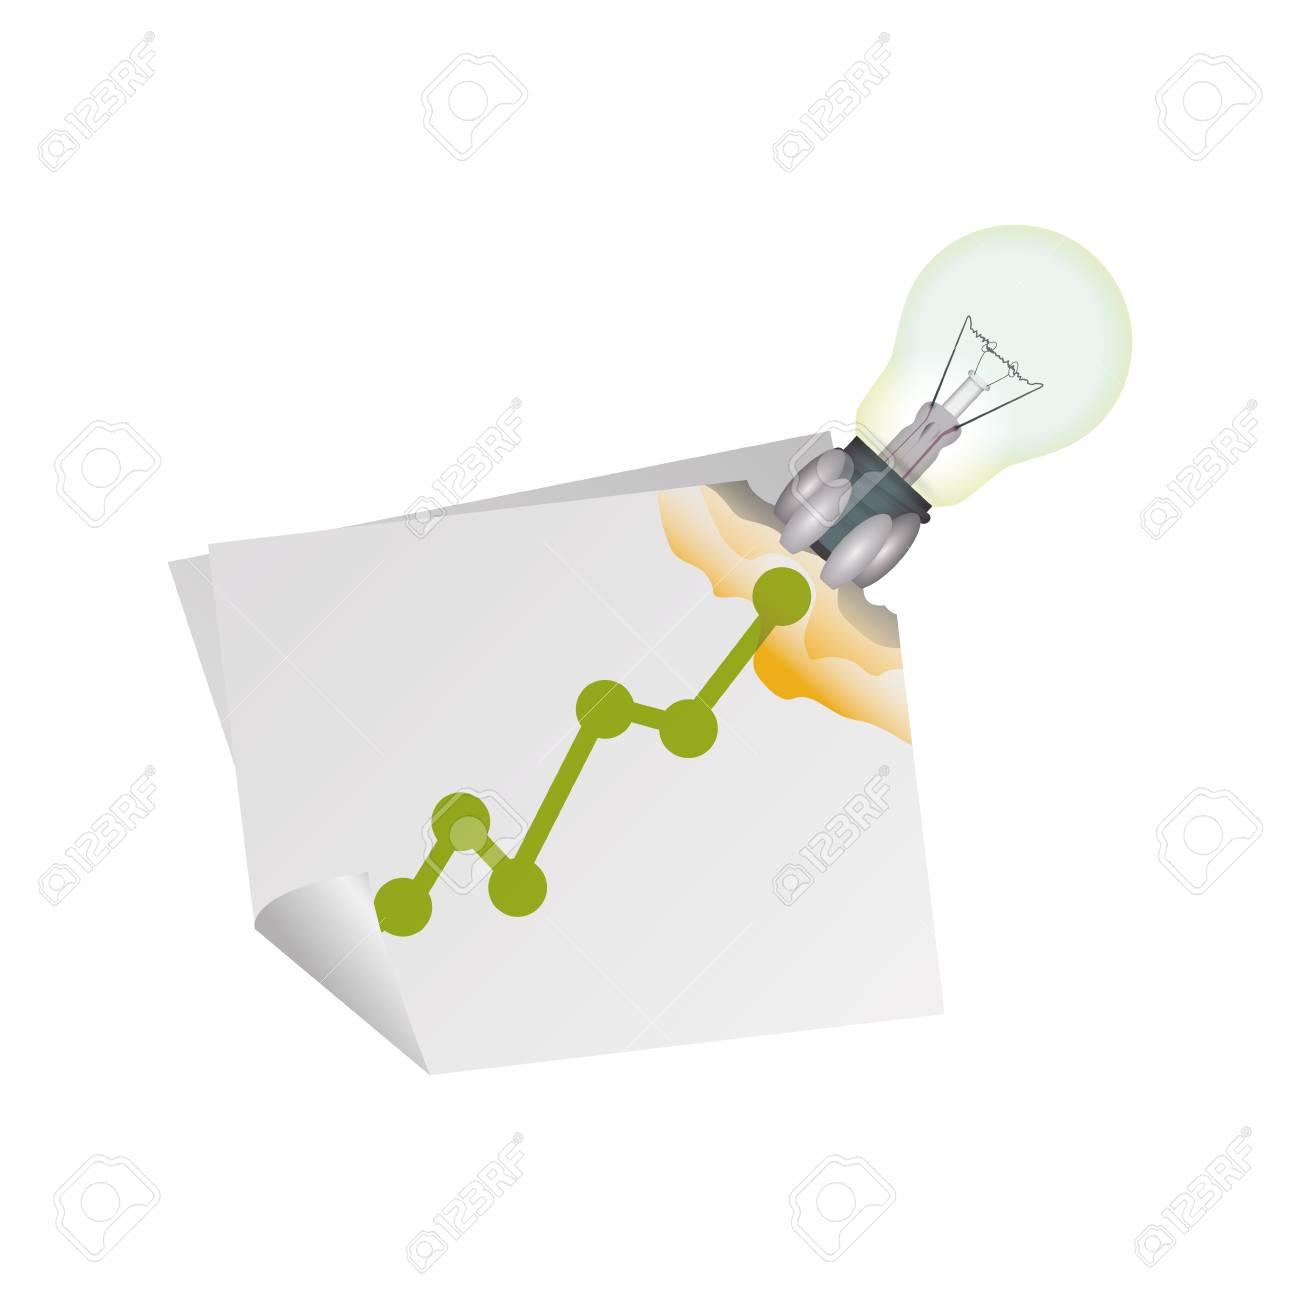 Birne Elektrische Energie Symbol Vektor Ilustration Grafikdesign ...